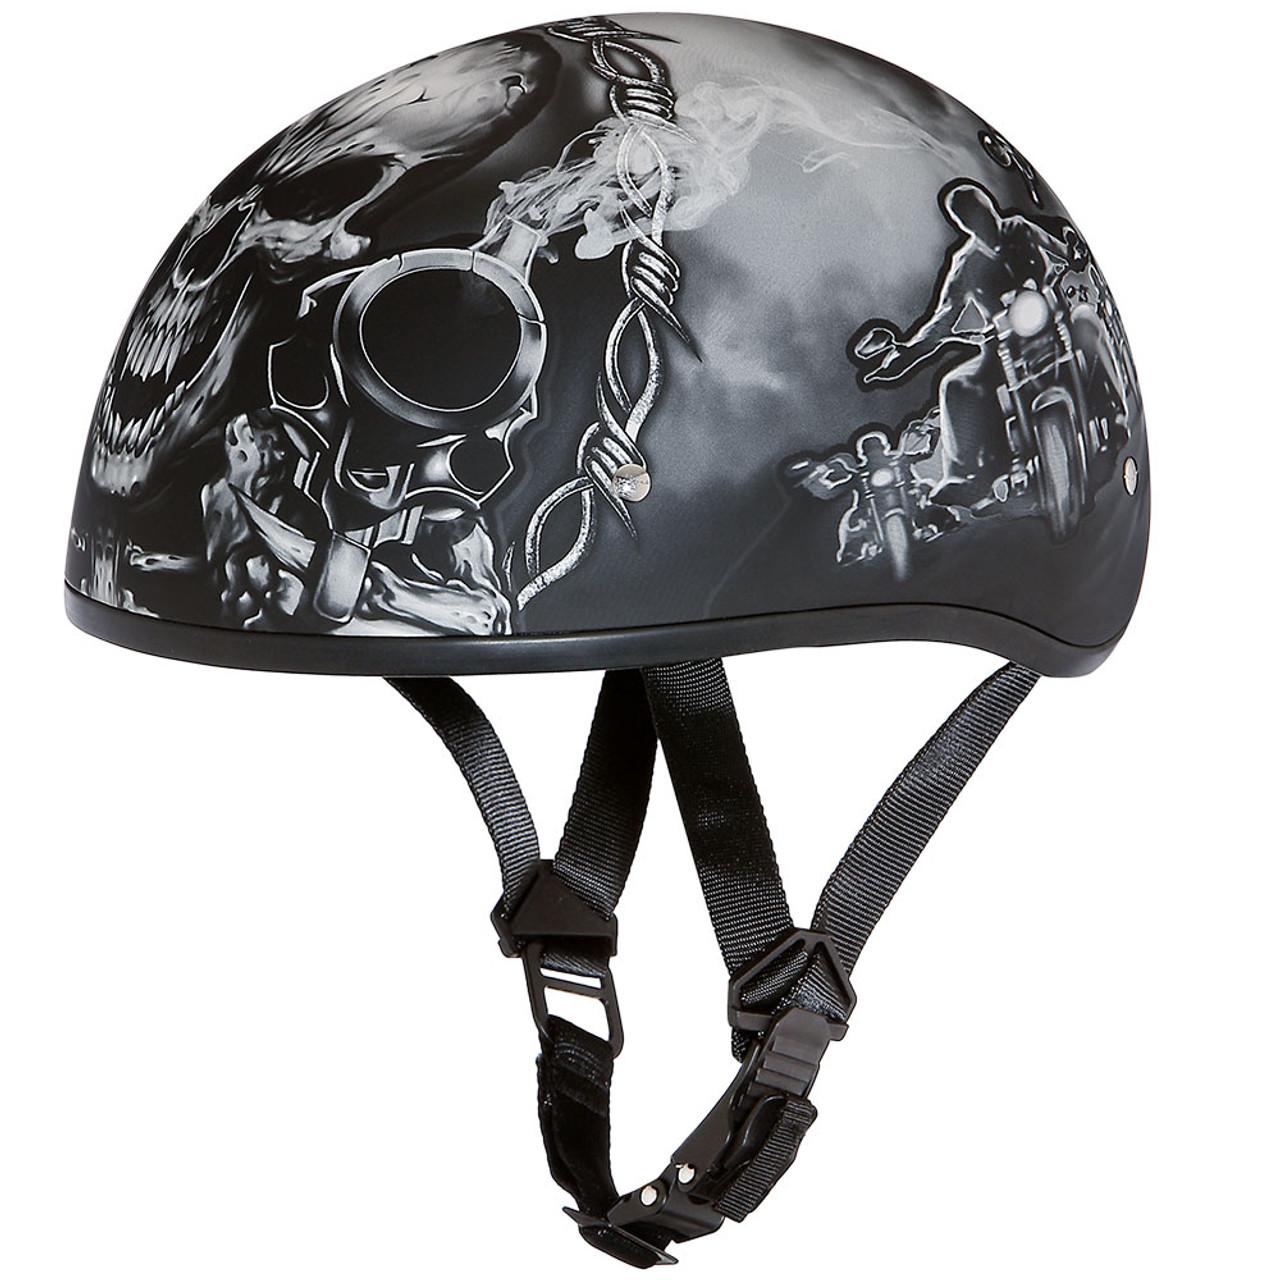 46989f5e Daytona DOT Guns Half Shell Motorcycle Helmet - Get Lowered Cycles